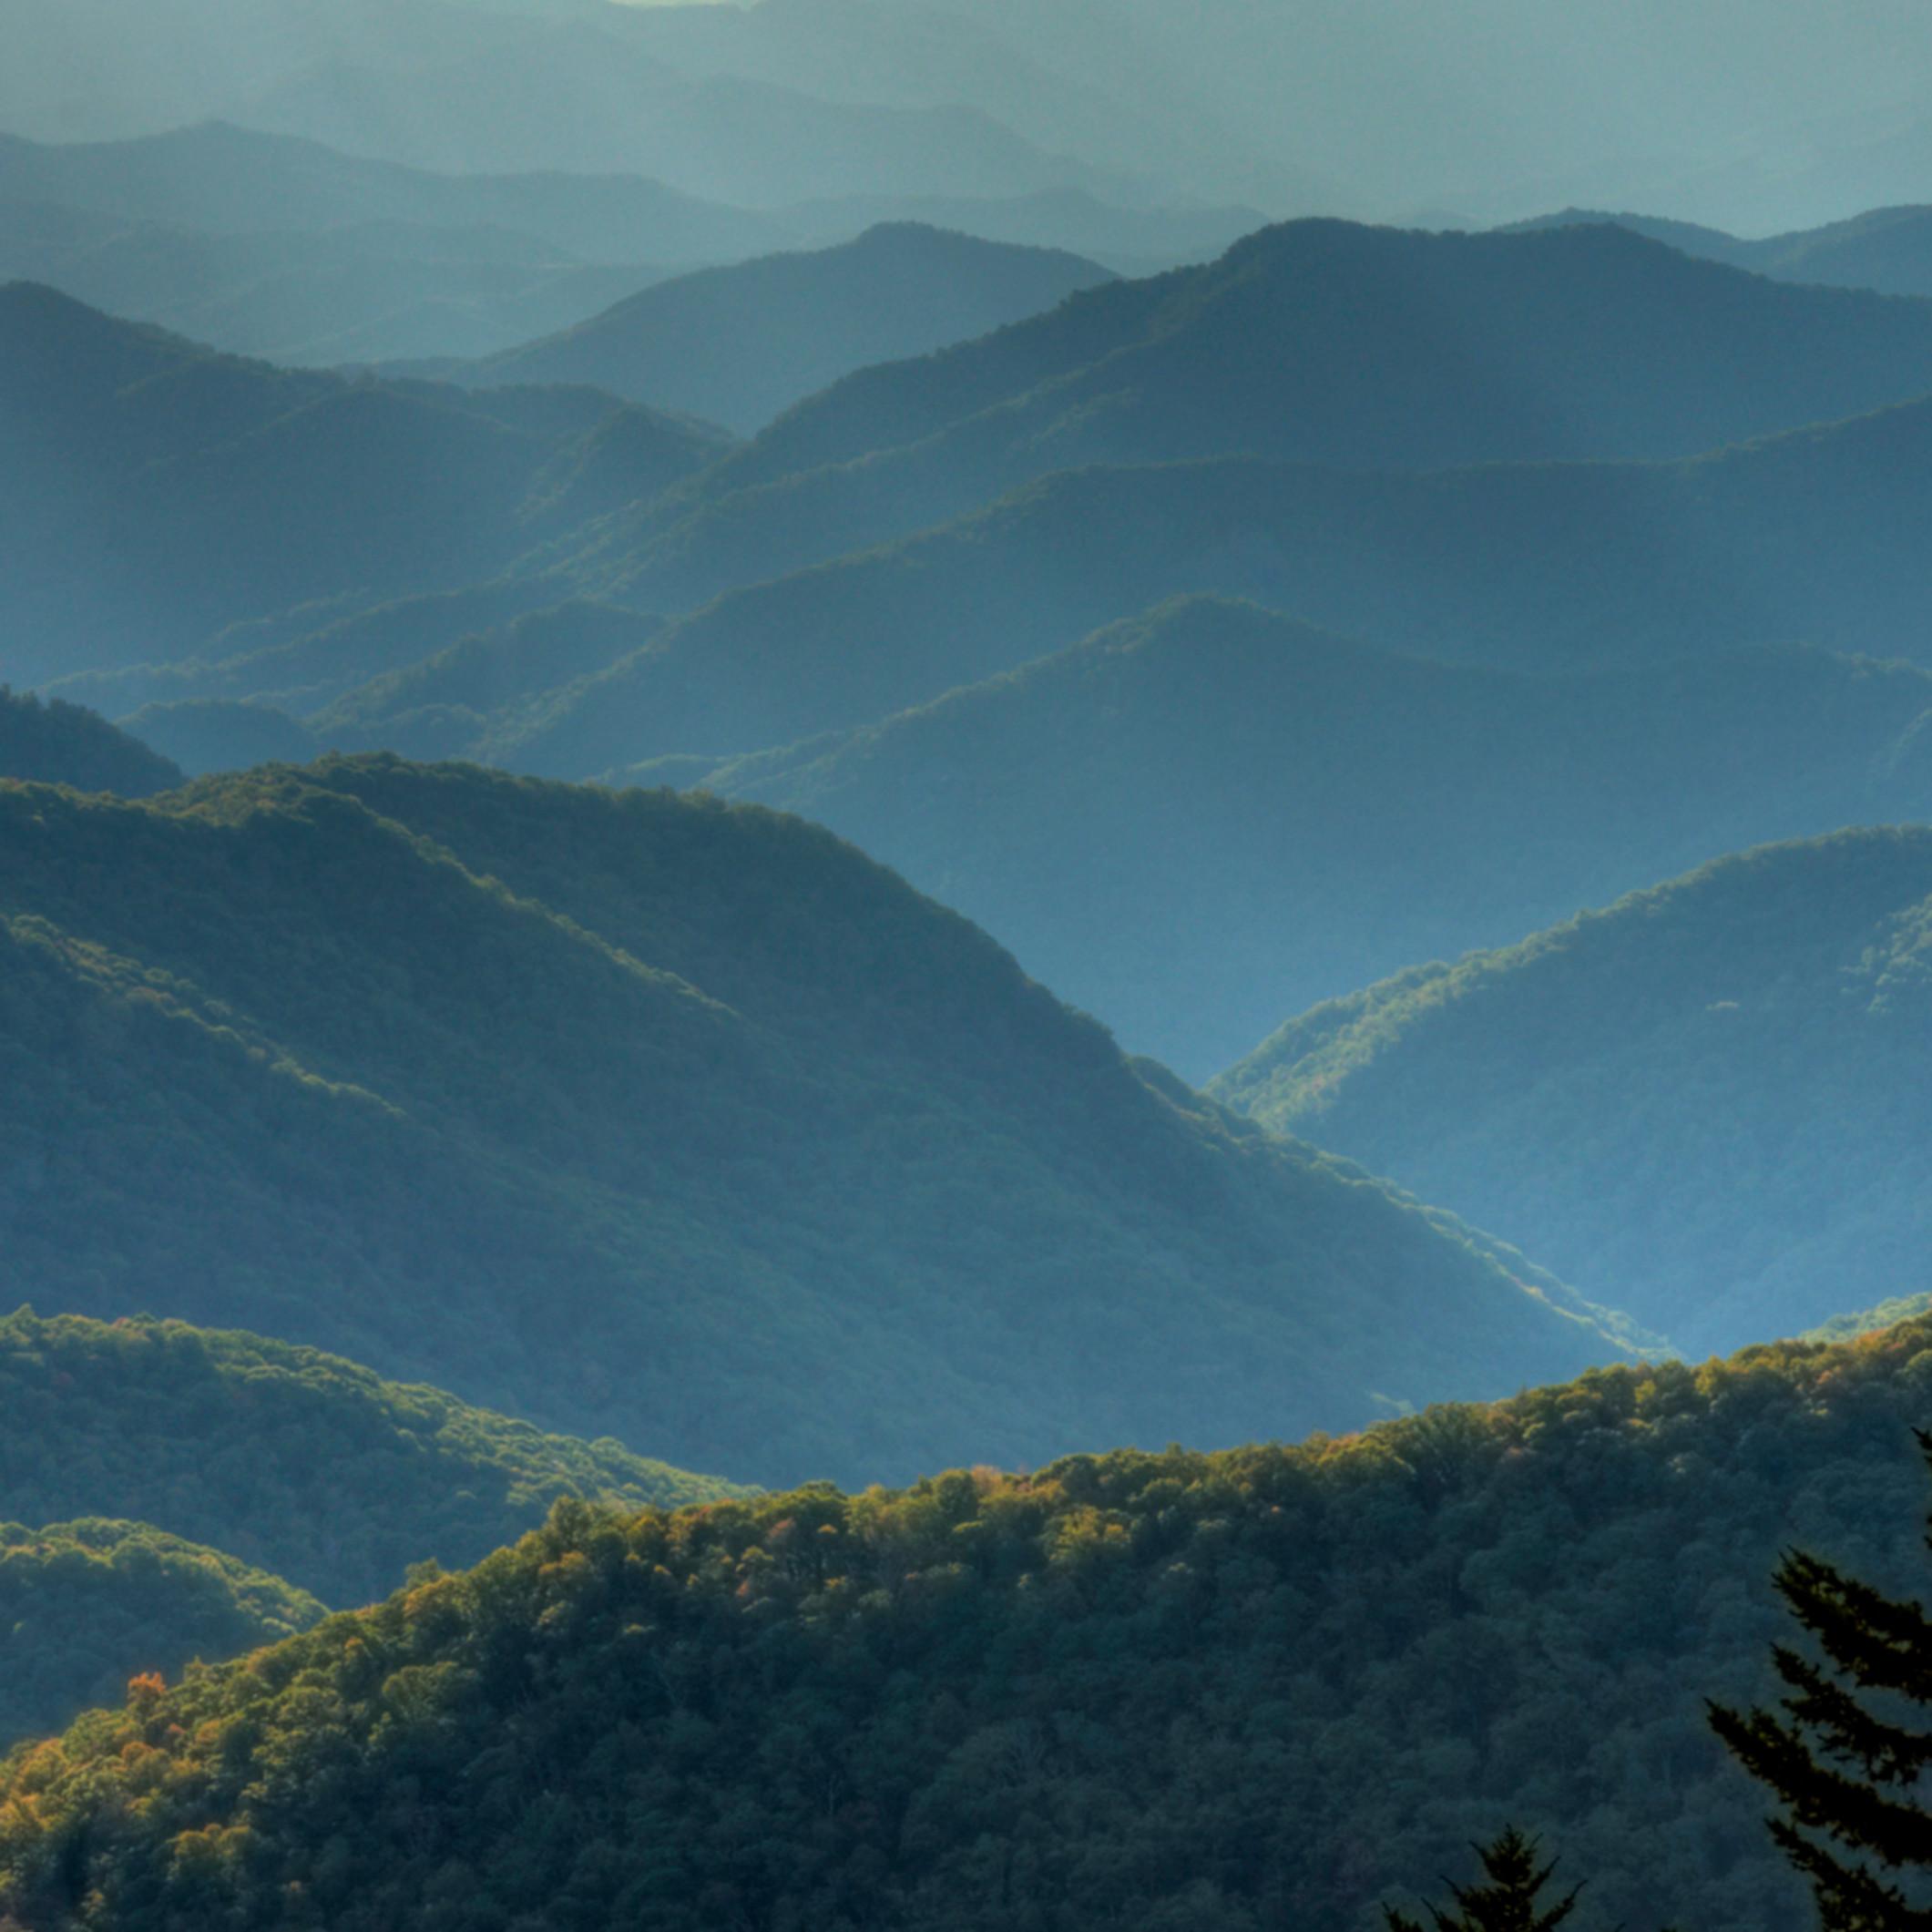 Mountain mood cwaizb